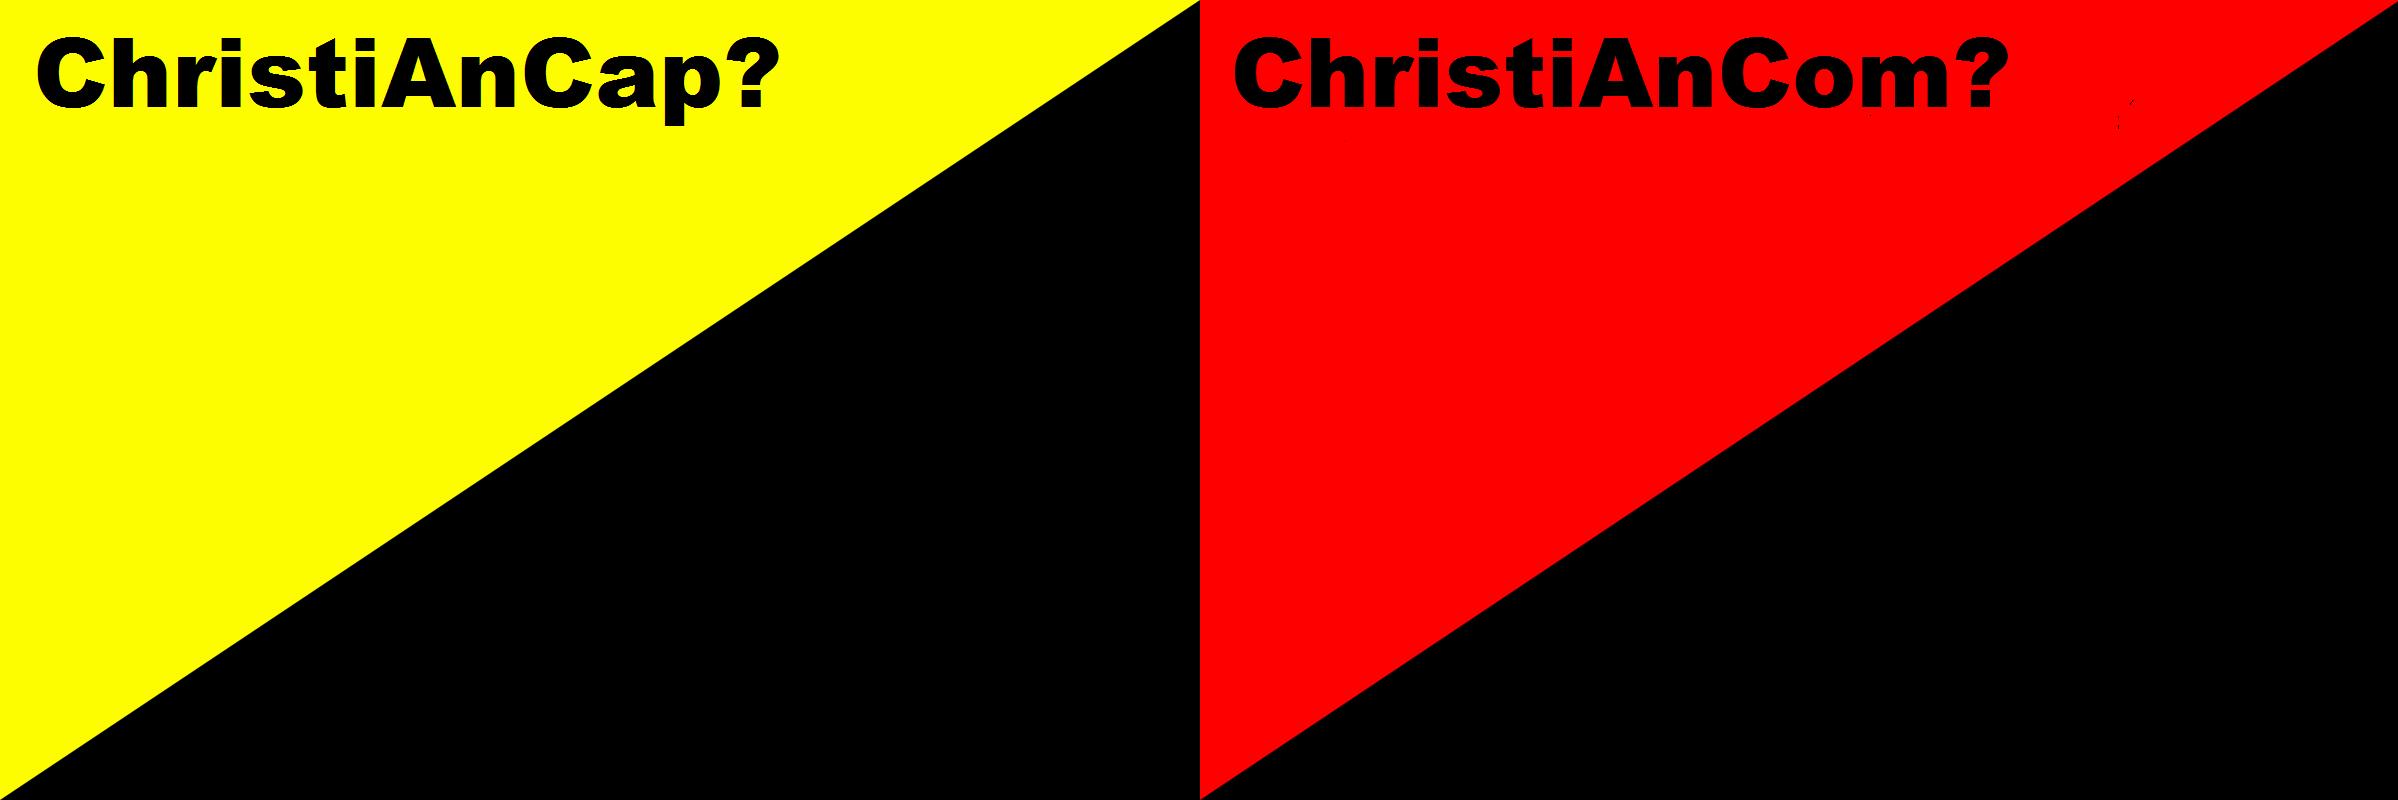 Black christiancom